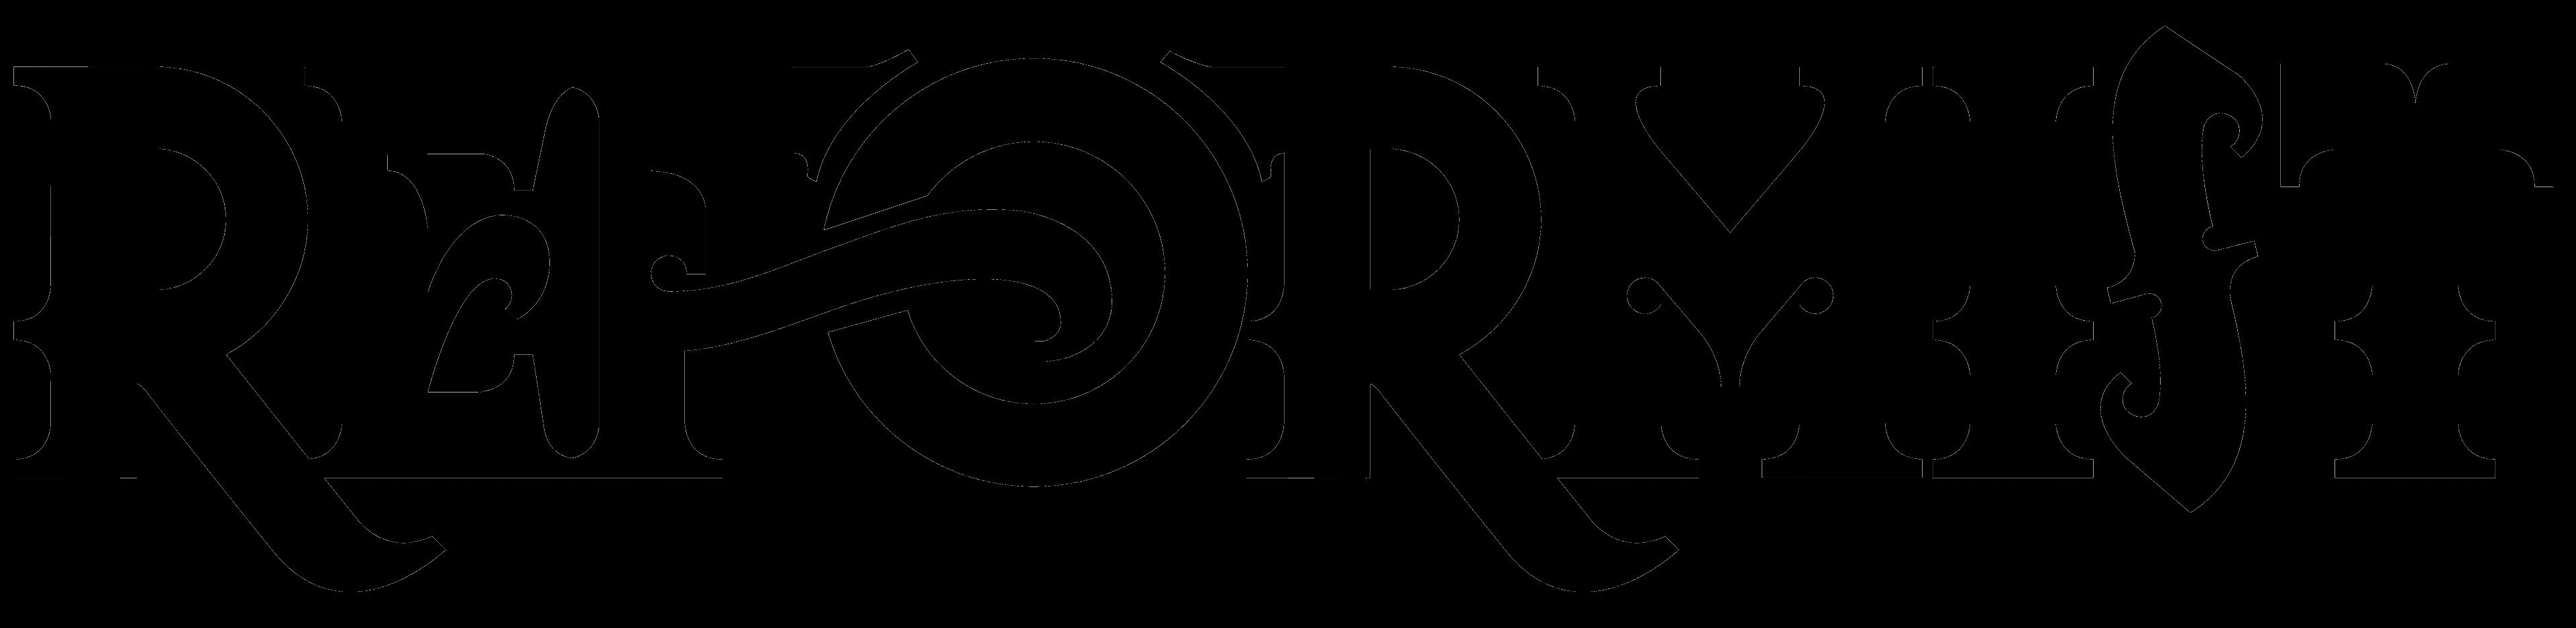 REFORMIST logo Black